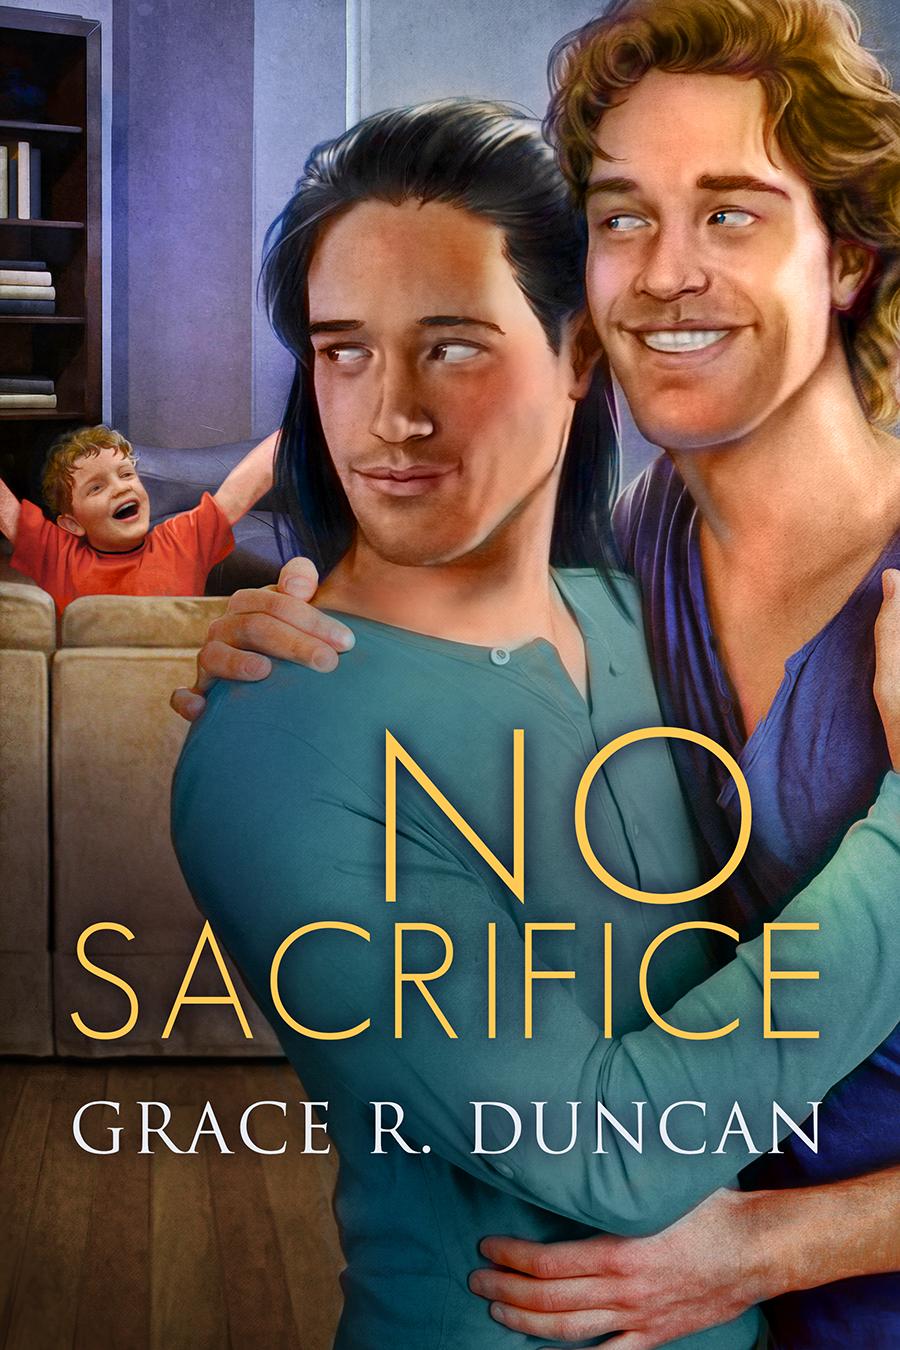 NoSacrifice2 by SeraniCrystalbrook